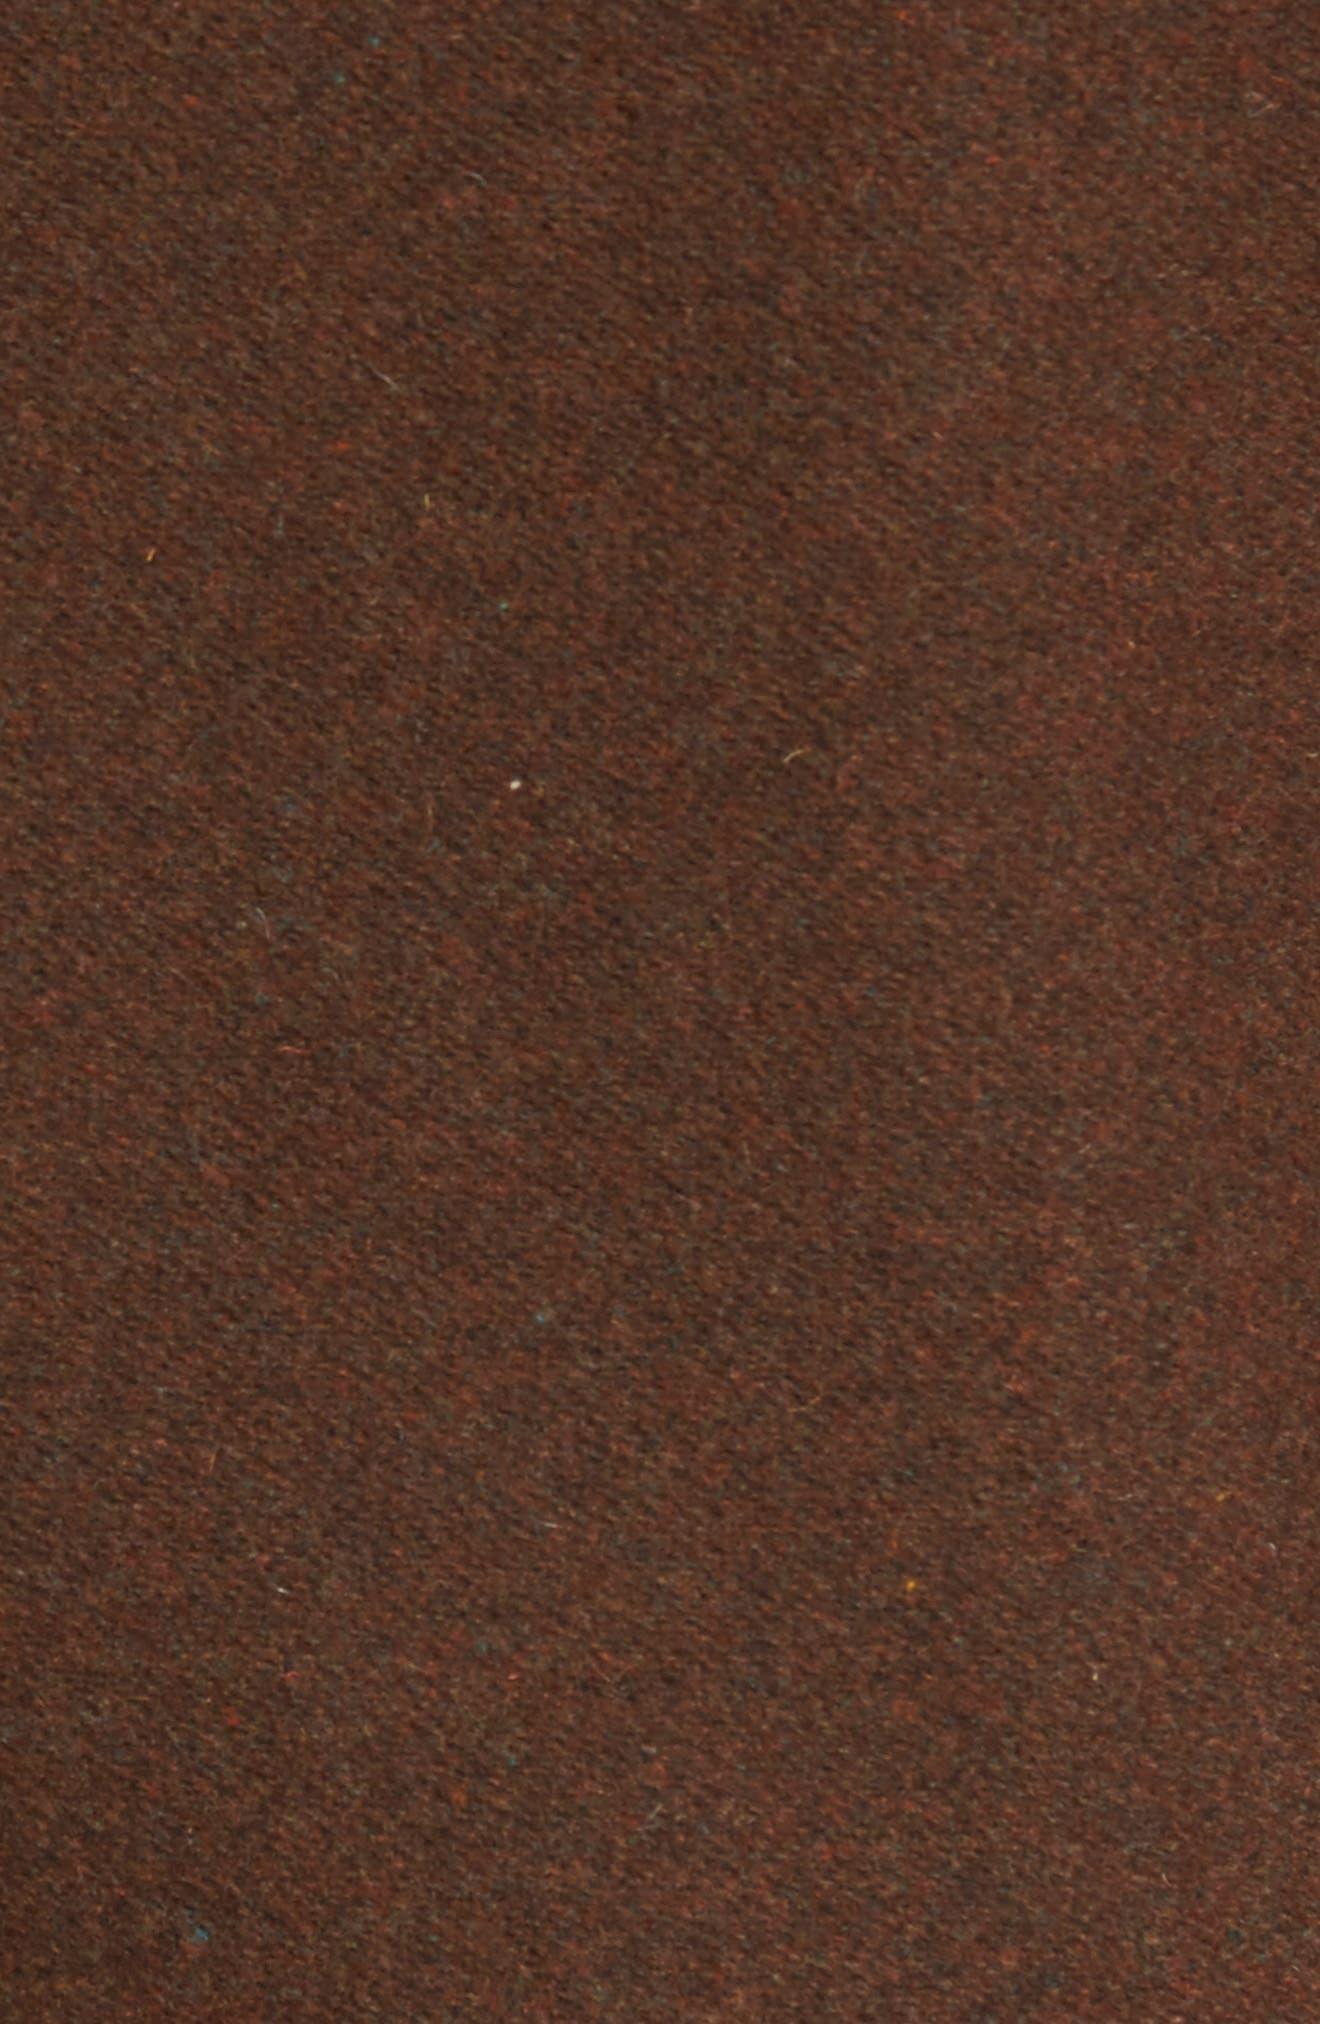 Liberty Wool Blend Zip Front Jacket,                             Alternate thumbnail 6, color,                             200